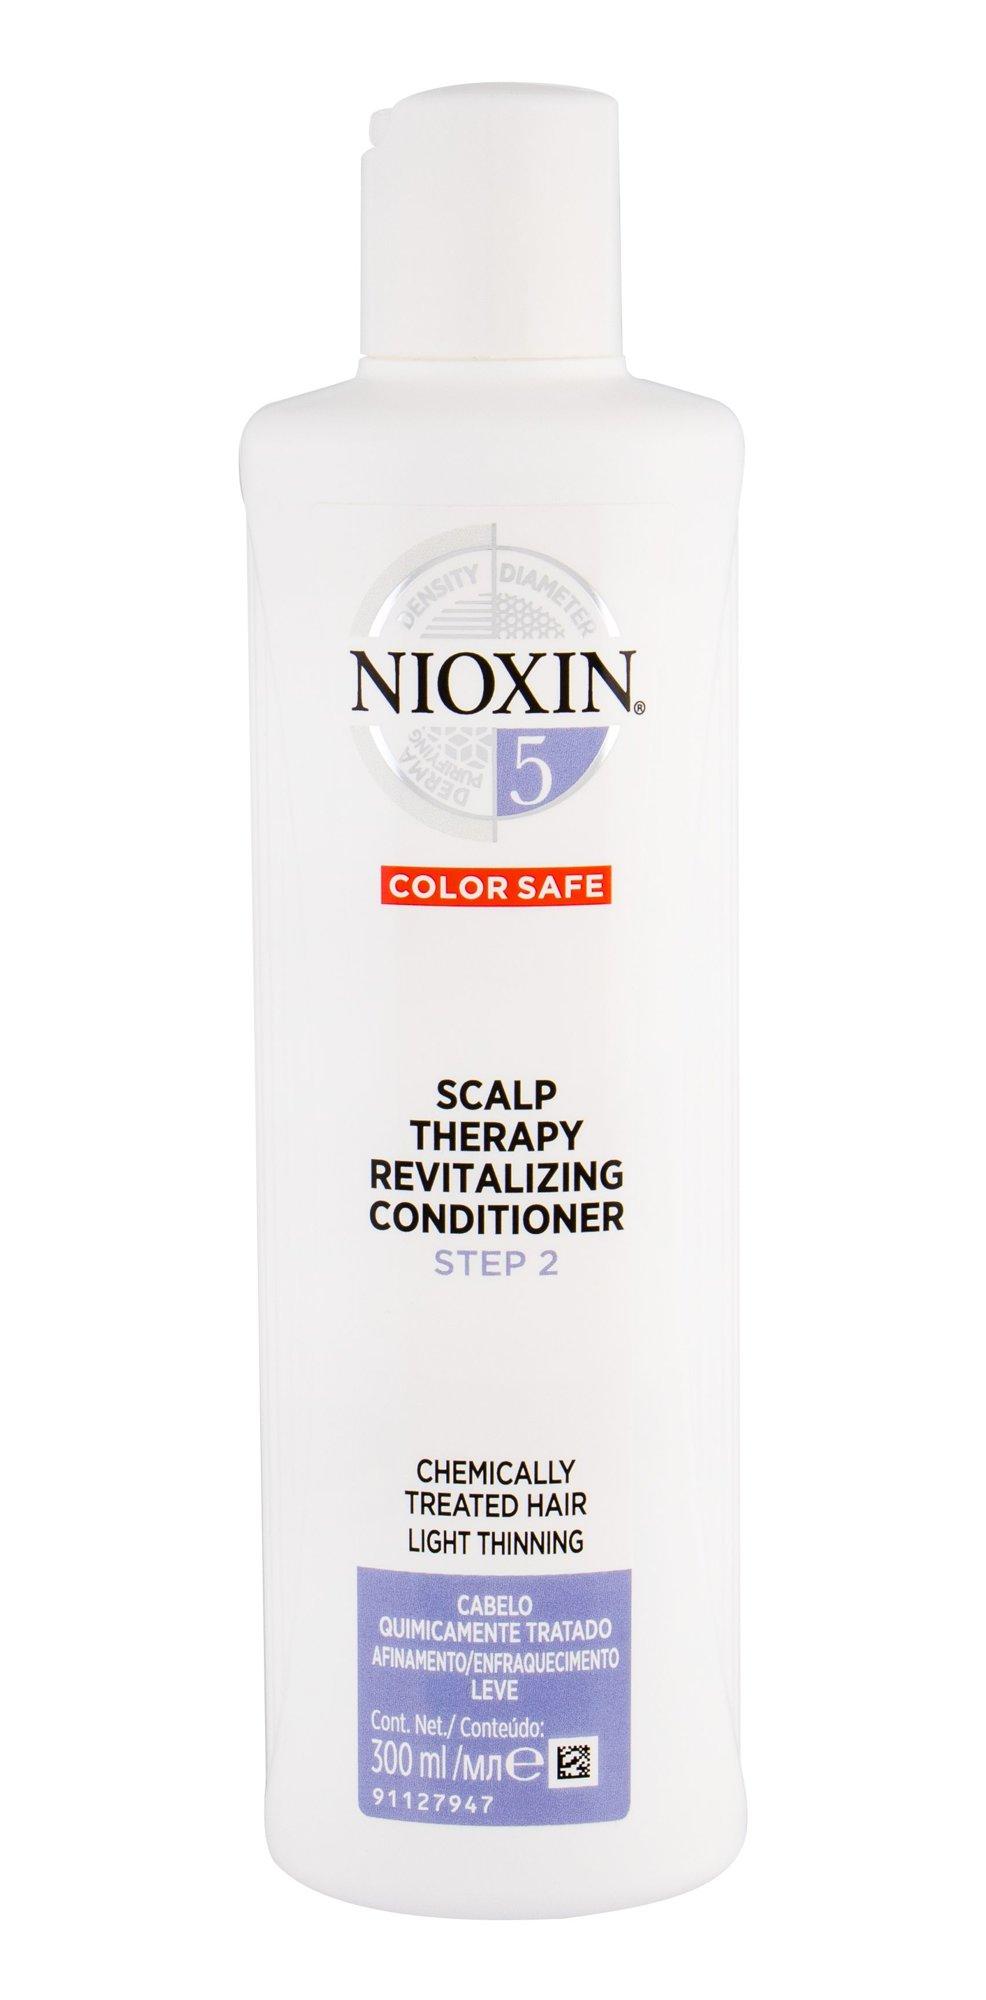 Nioxin System 5 Conditioner 300ml